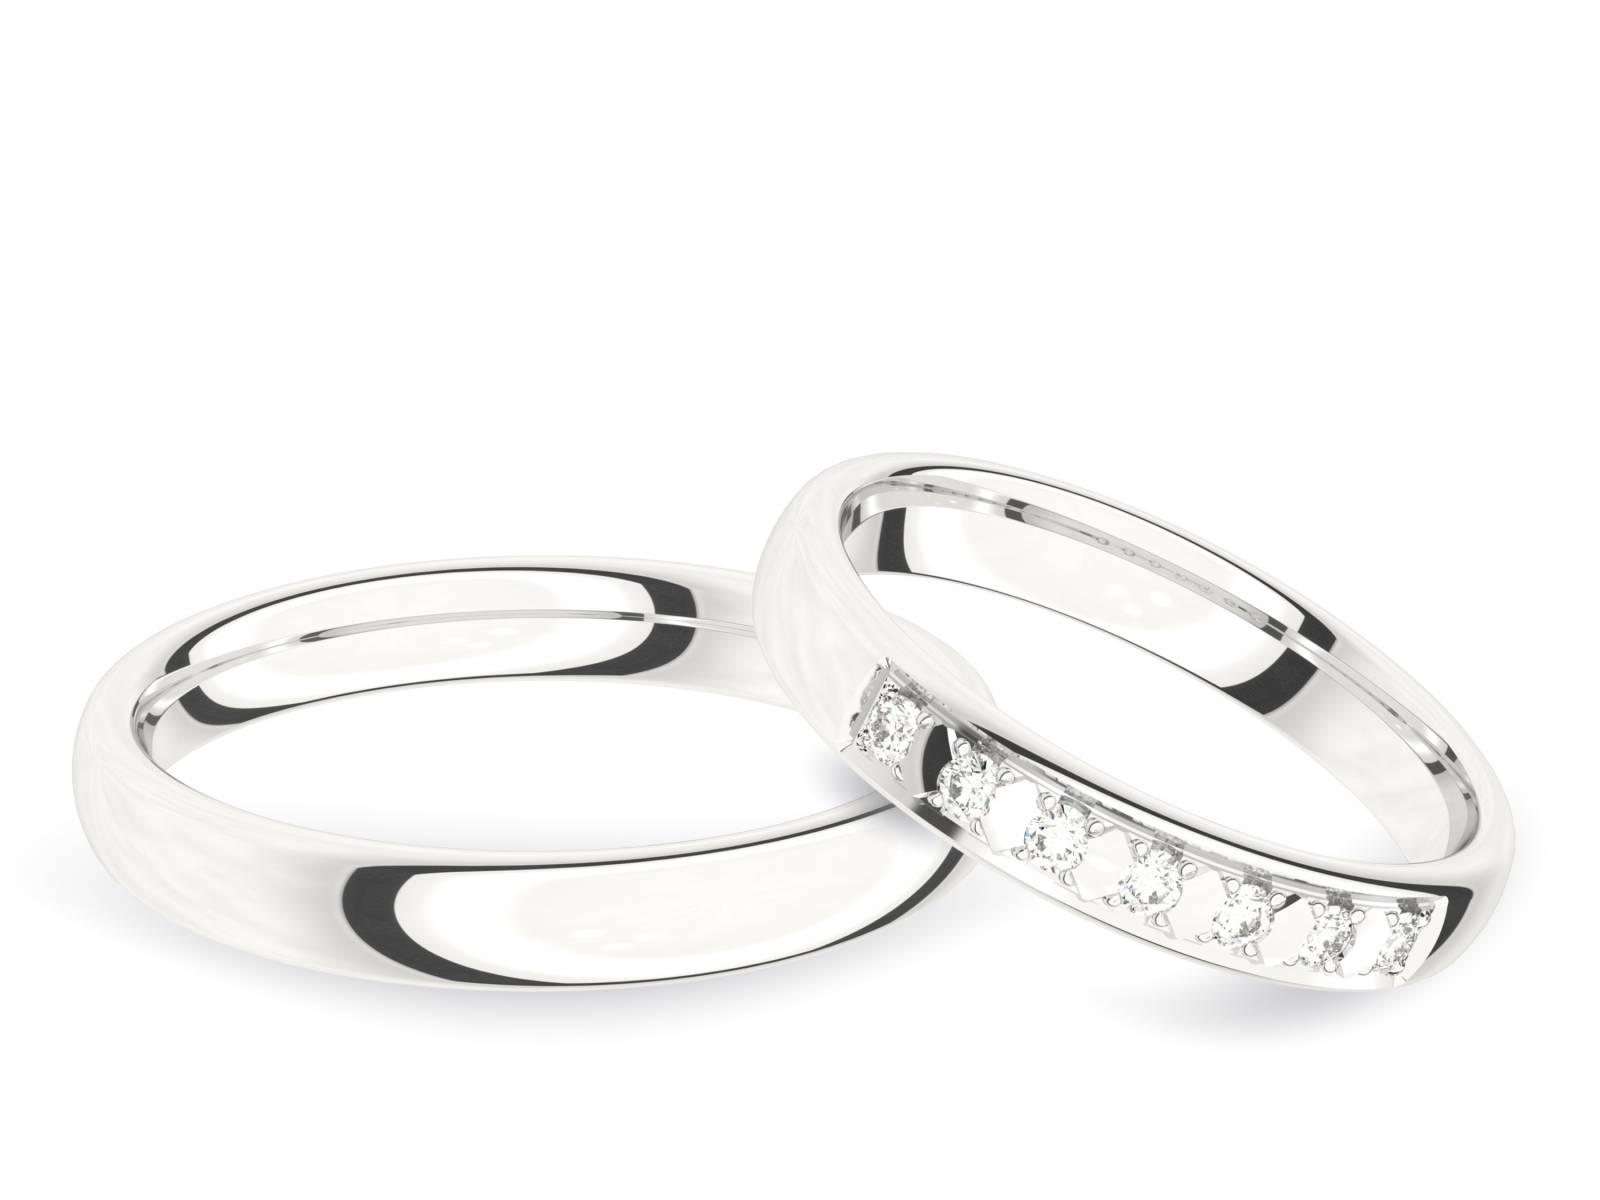 Juwelier Jan Maes - Trouwringen - Verlovingsringen - Juwelen - House of Weddings - 1